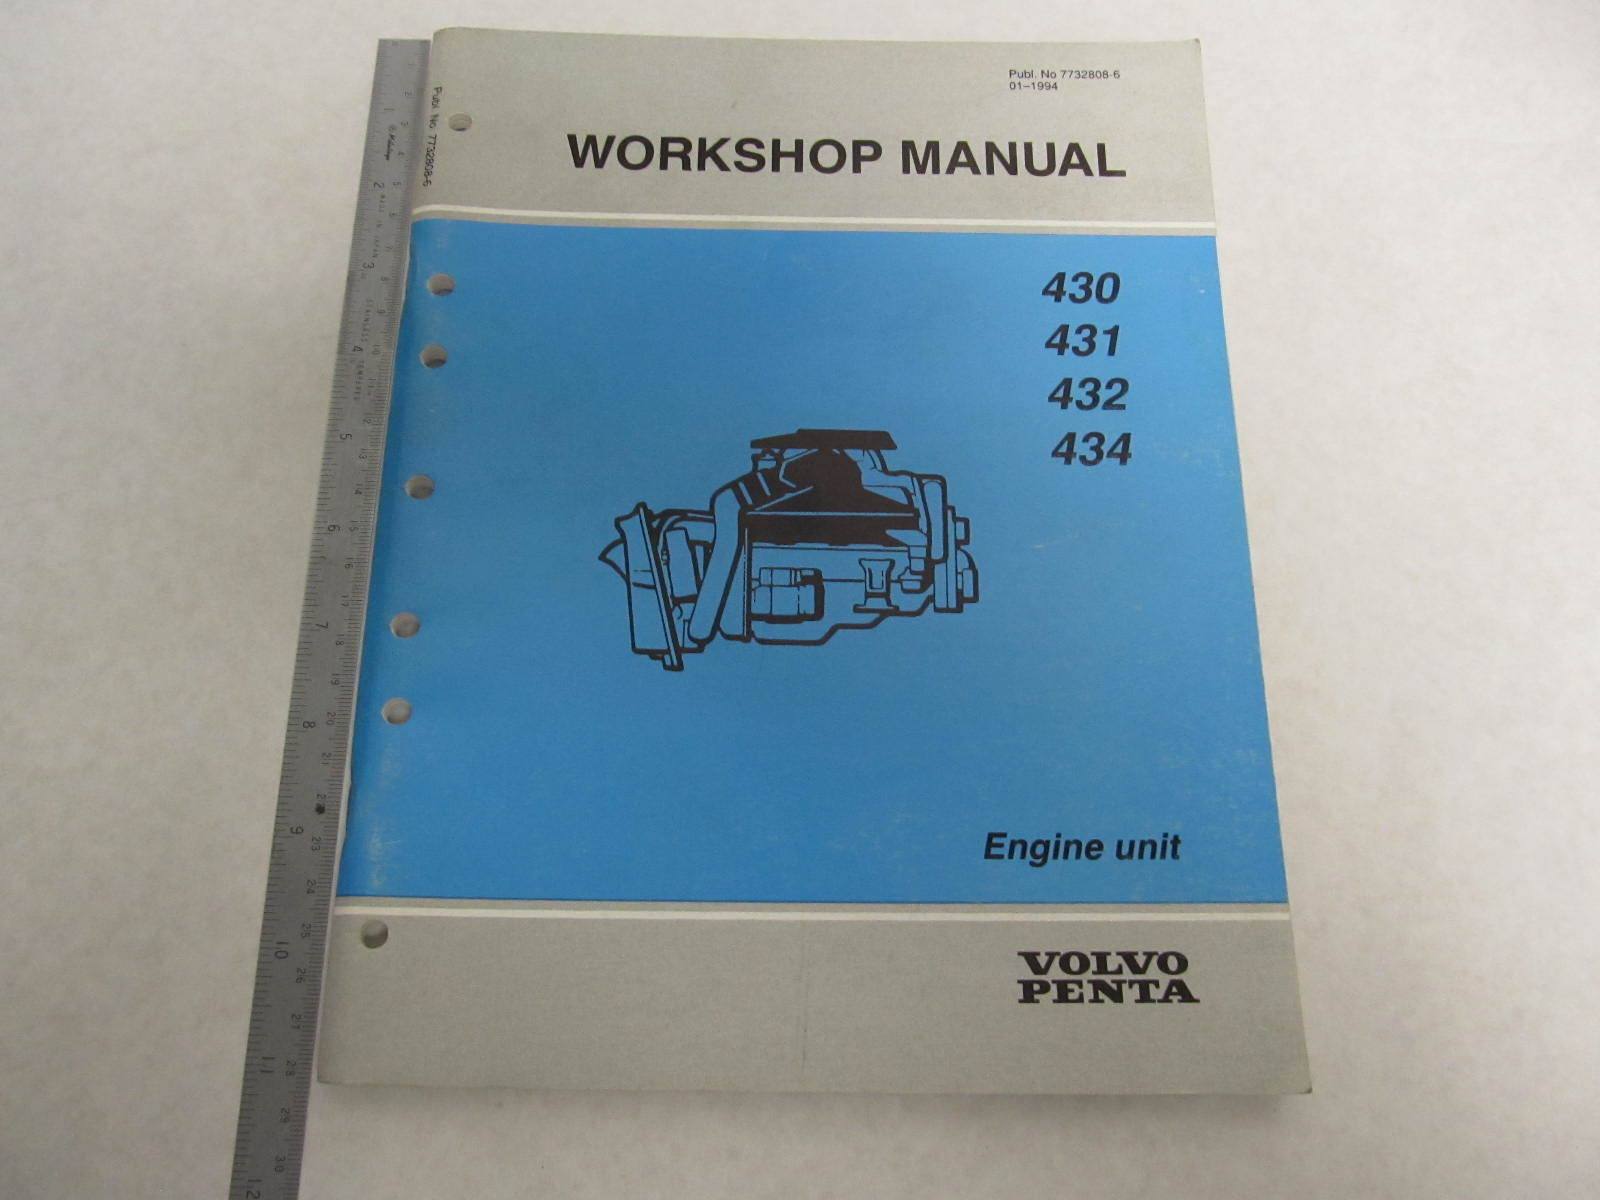 Volvo penta service manual online D55